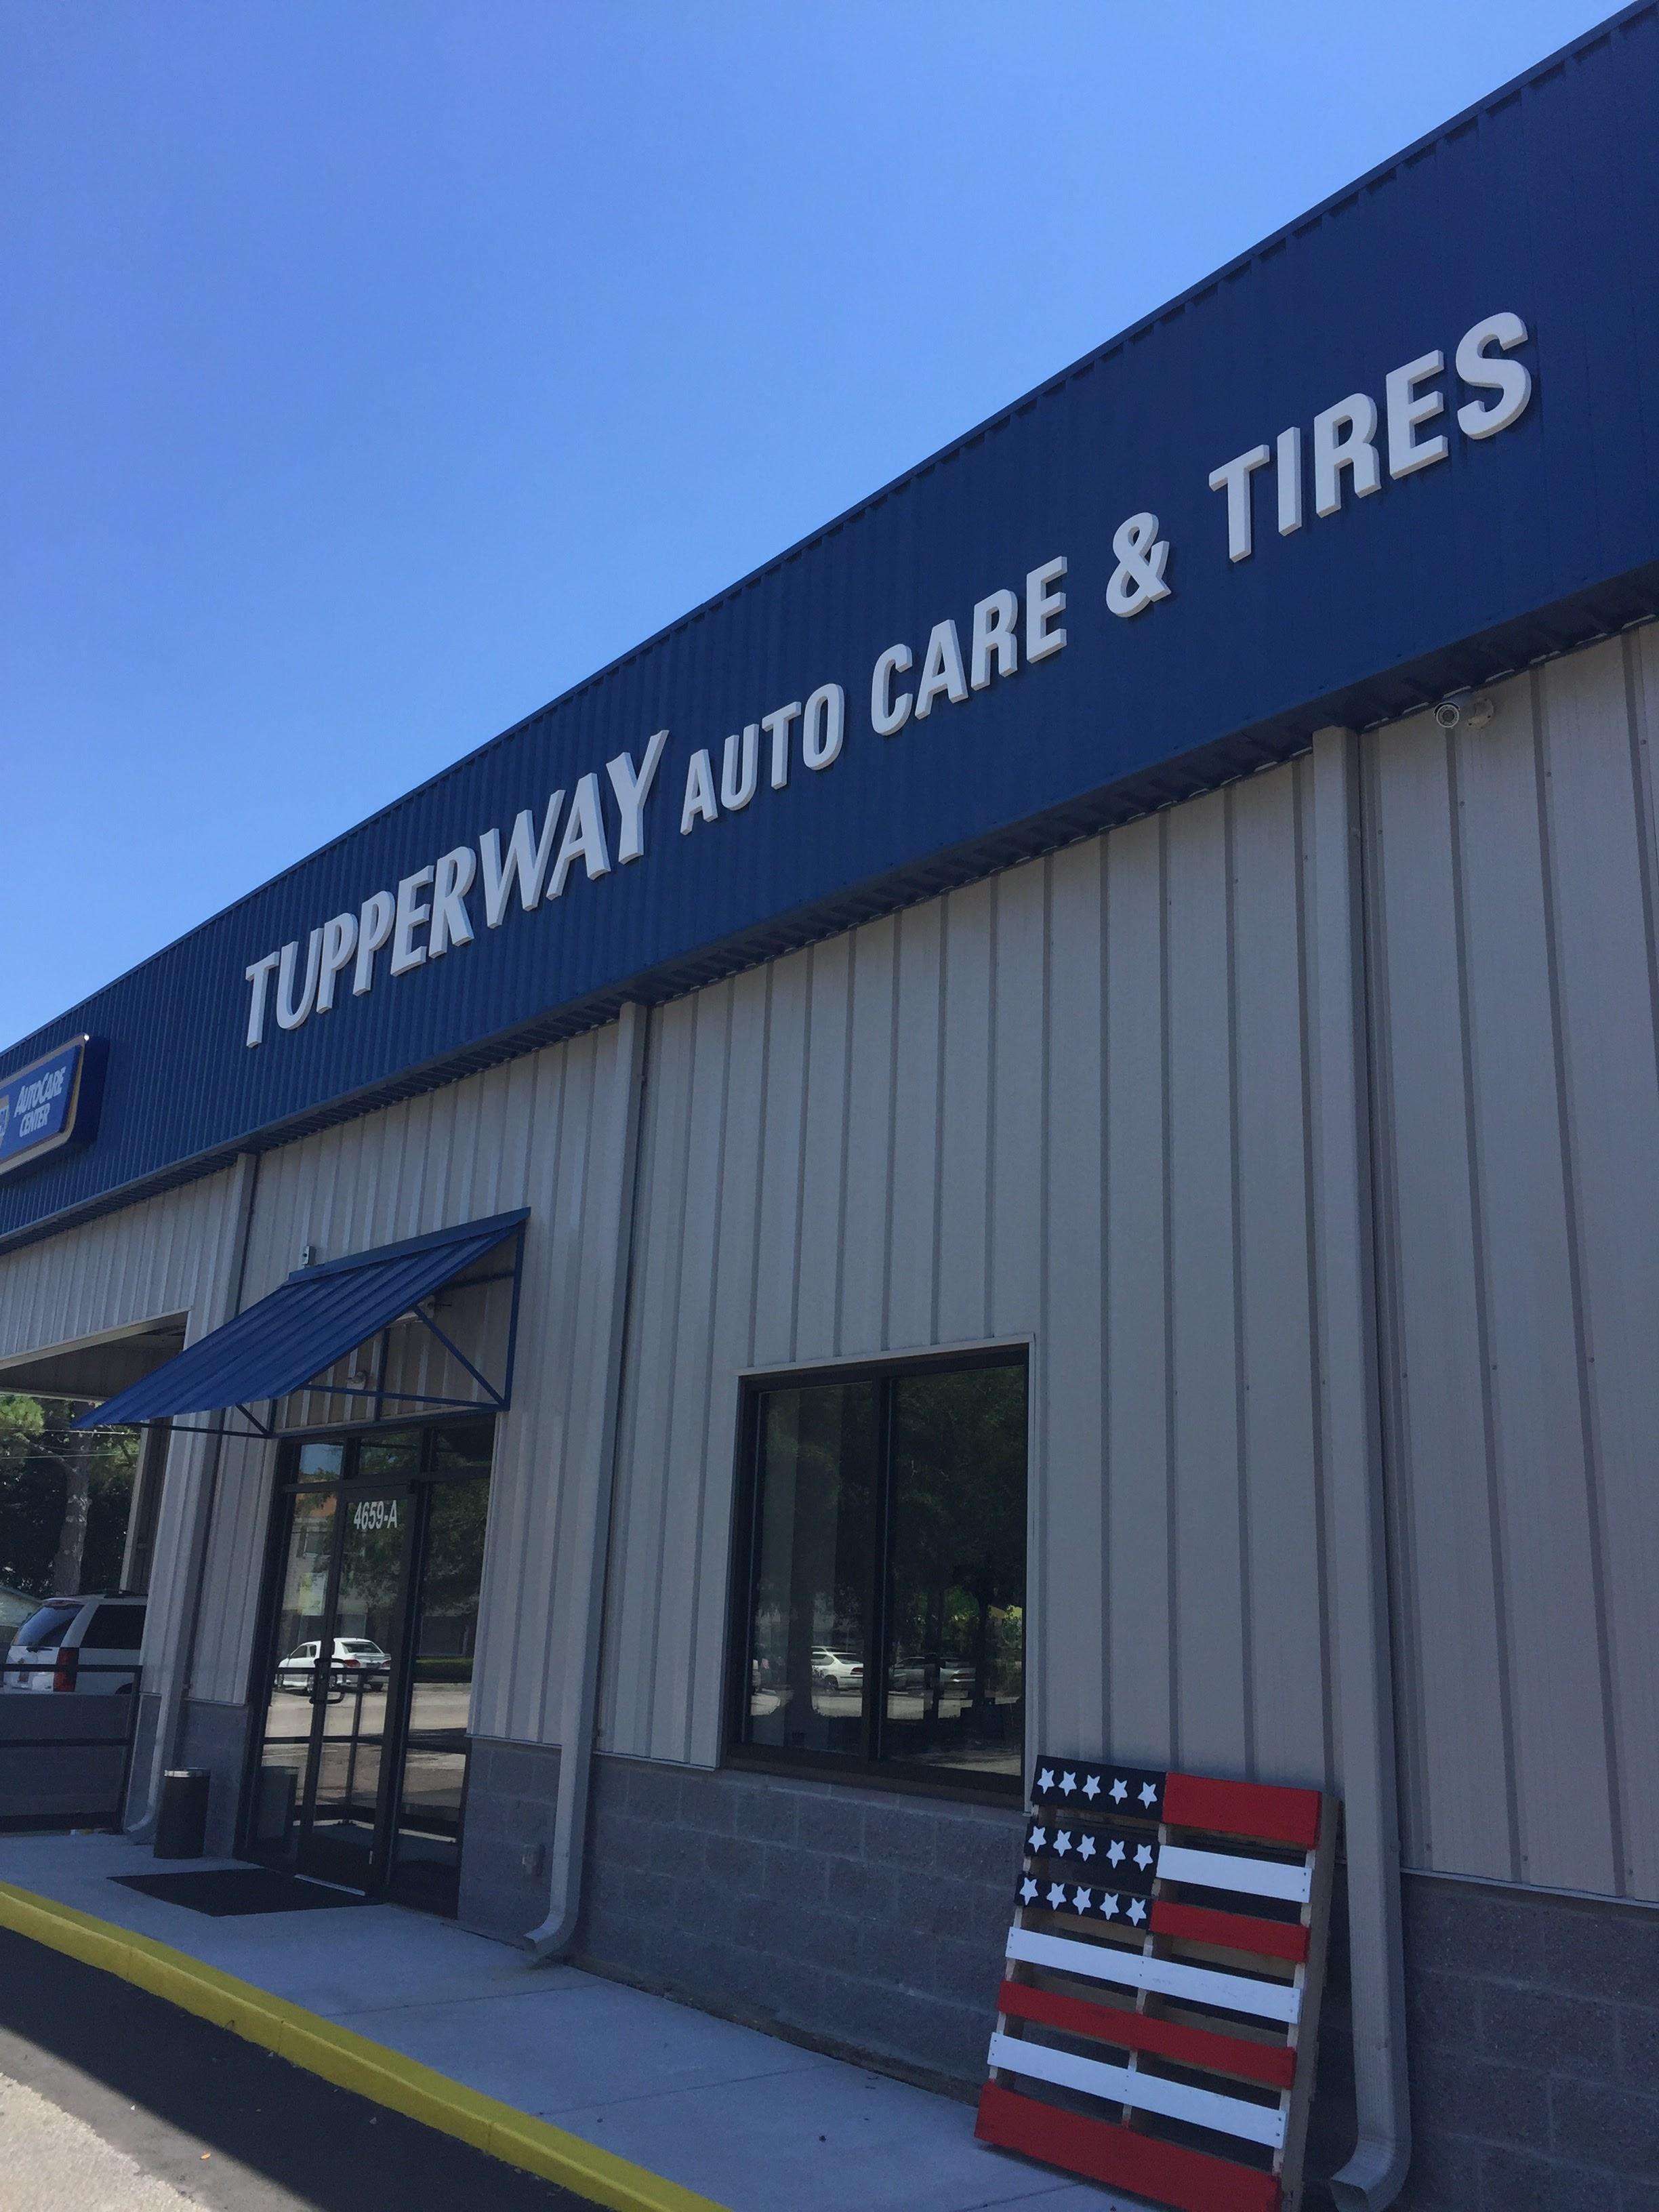 tupperway auto care tires ladson south carolina sc localdatabasecom